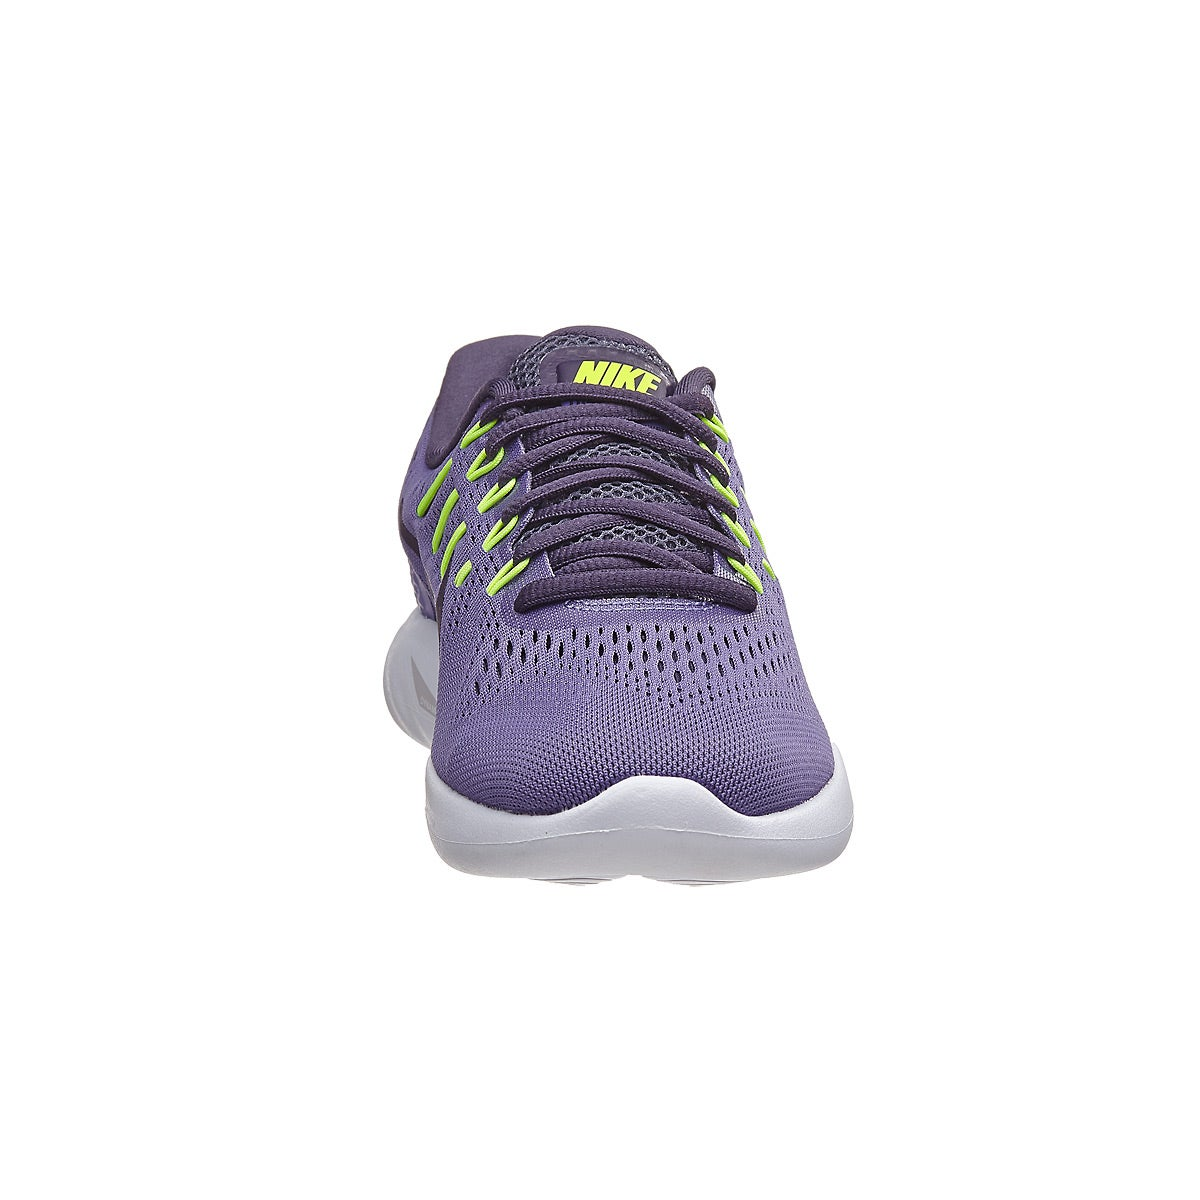 free shipping 502d1 e89e2 Nike LunarGlide 8 Womens Shoes PurpleDark Raisin 360° View Running  Warehouse.